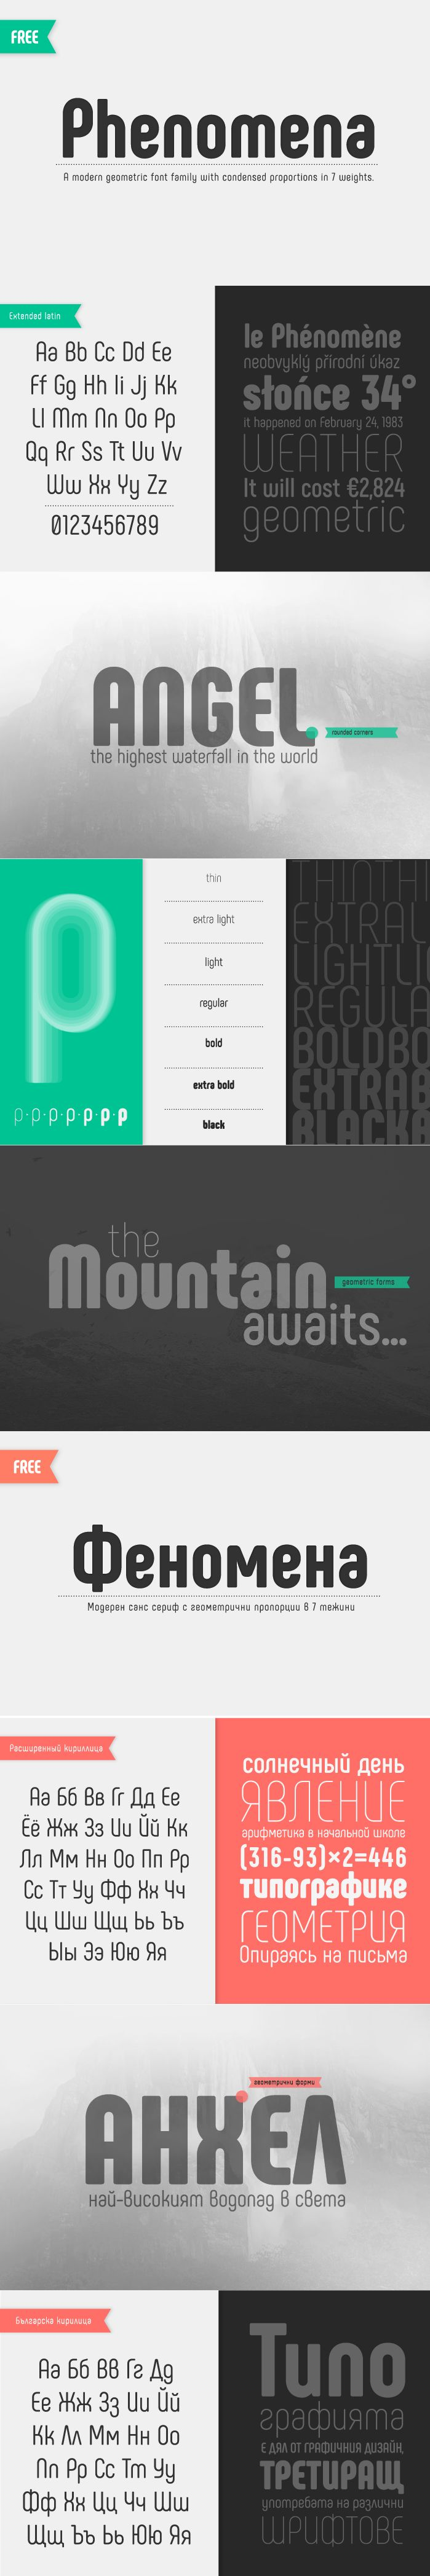 Phenomena font - Fontfabric